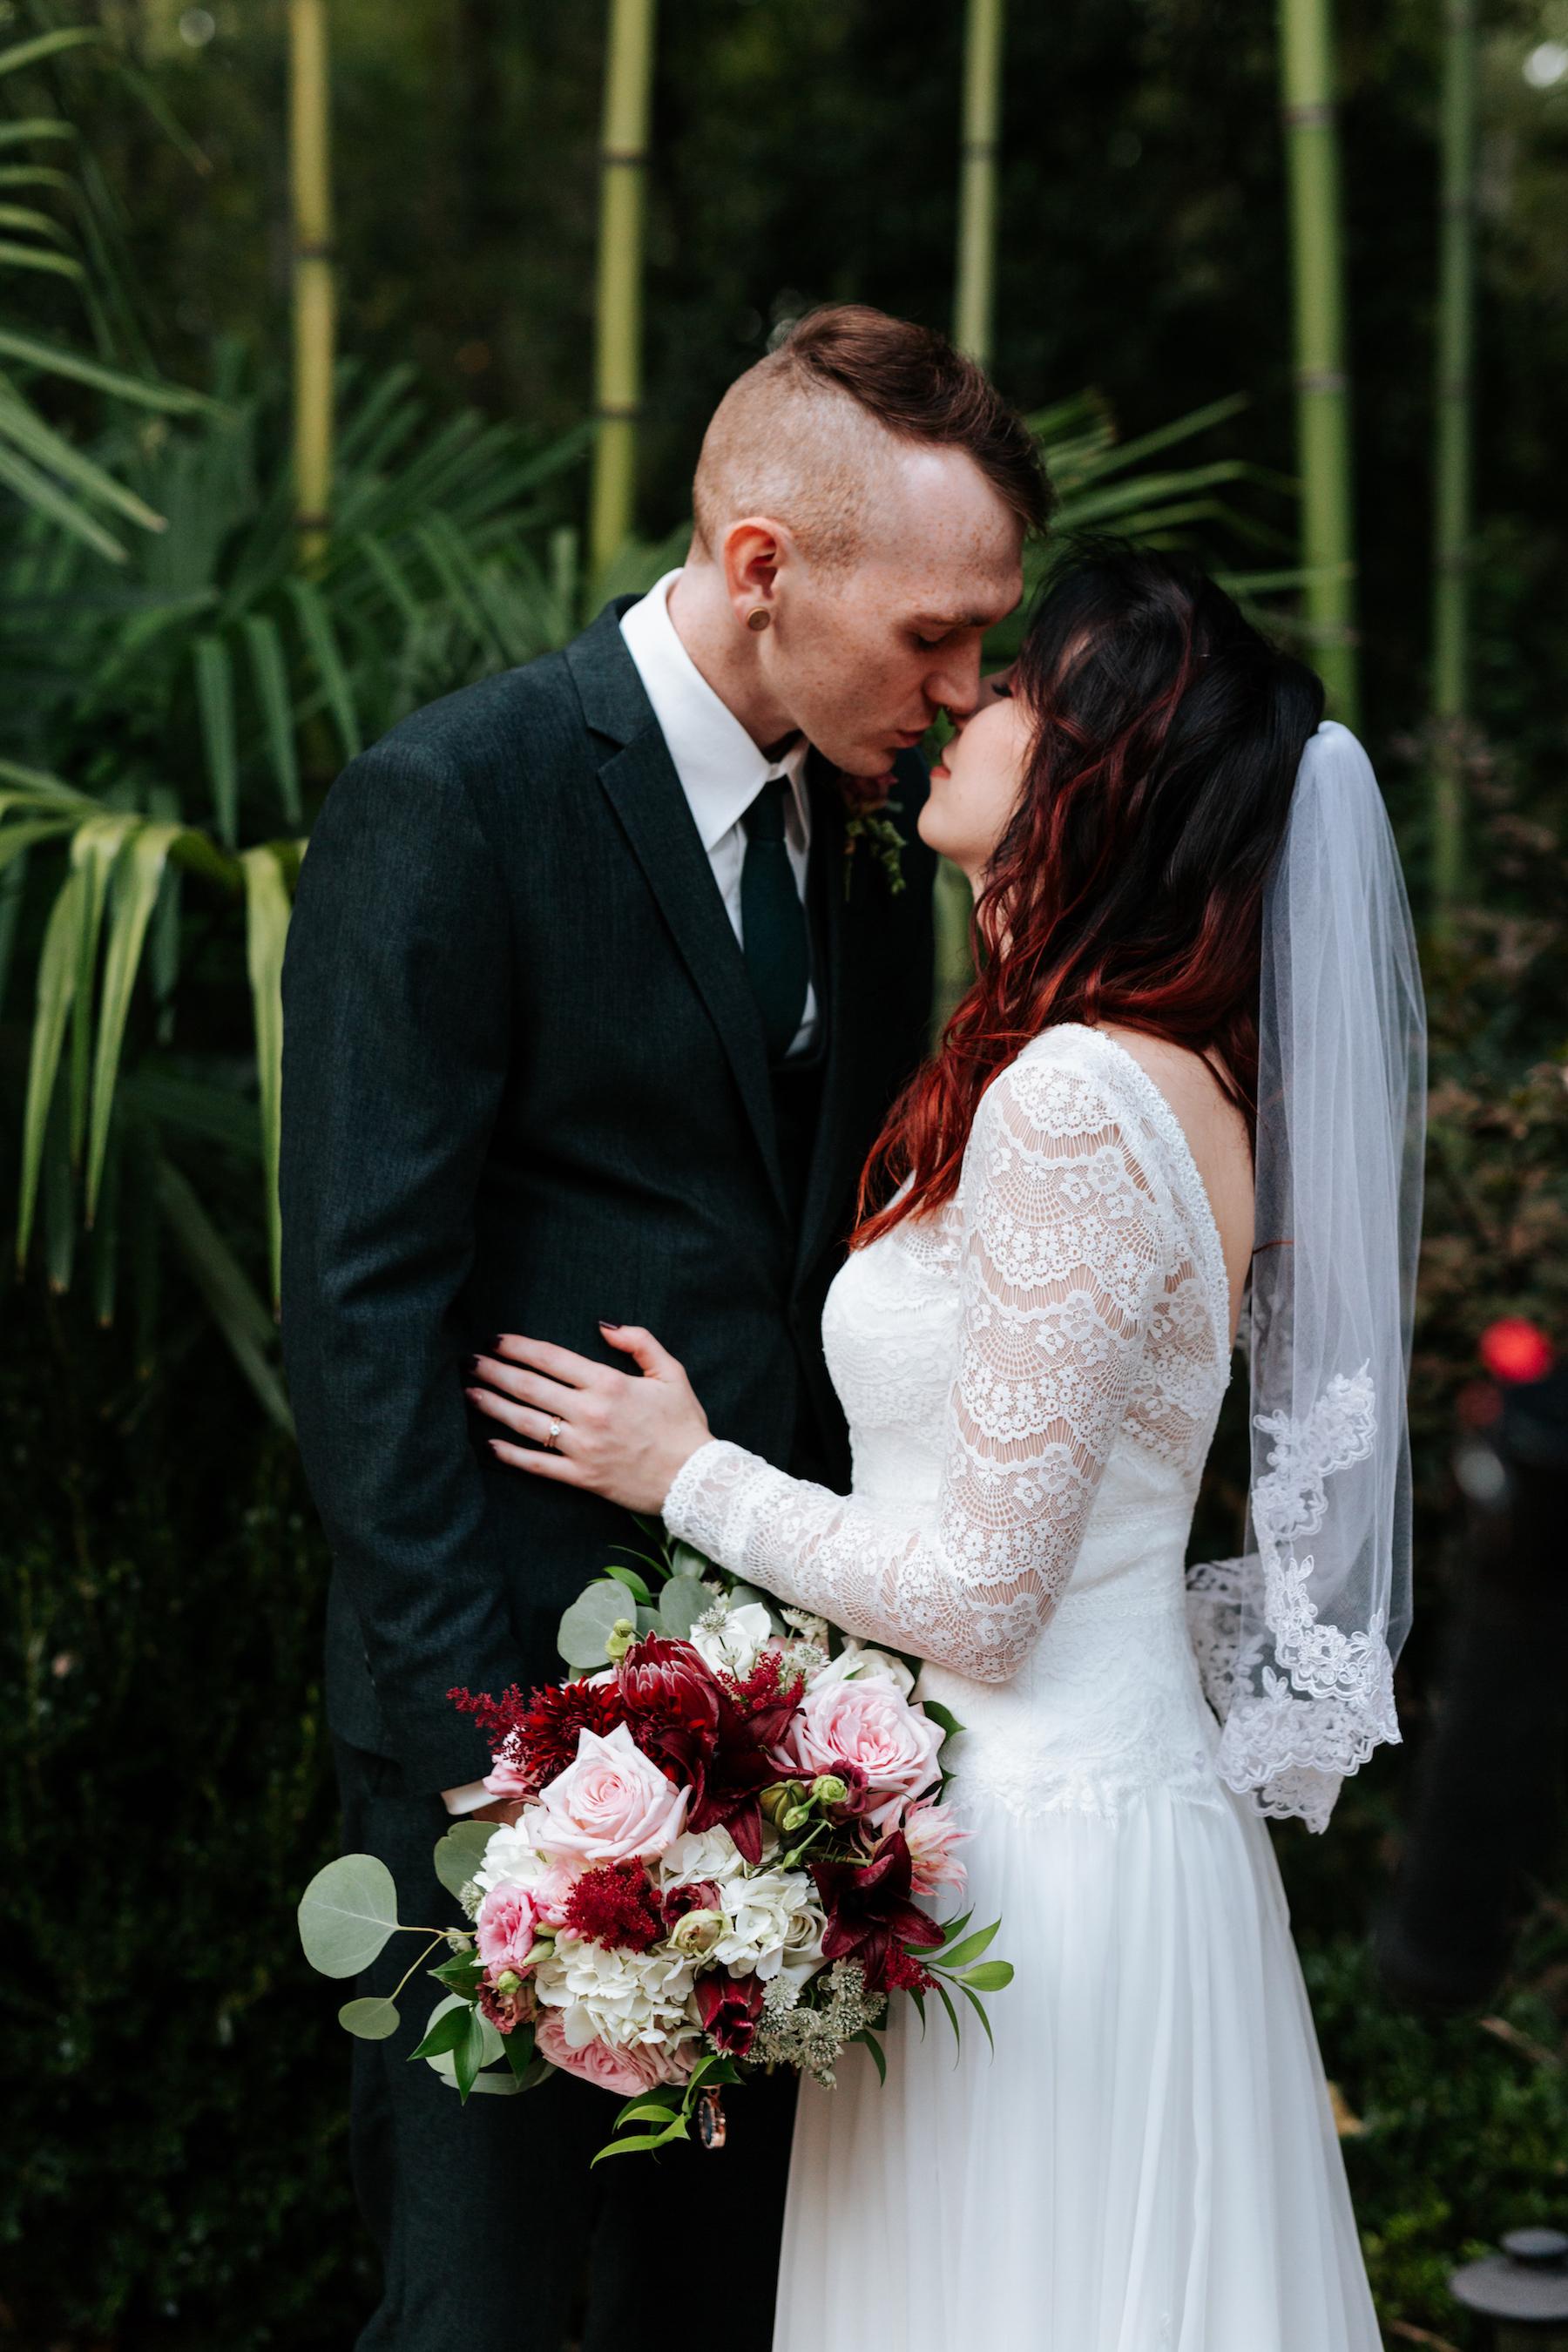 South-Carolina-Wedding-Engagement-Bridal-Photographer-Columbia-Greenville-Spartanburg-748.JPG